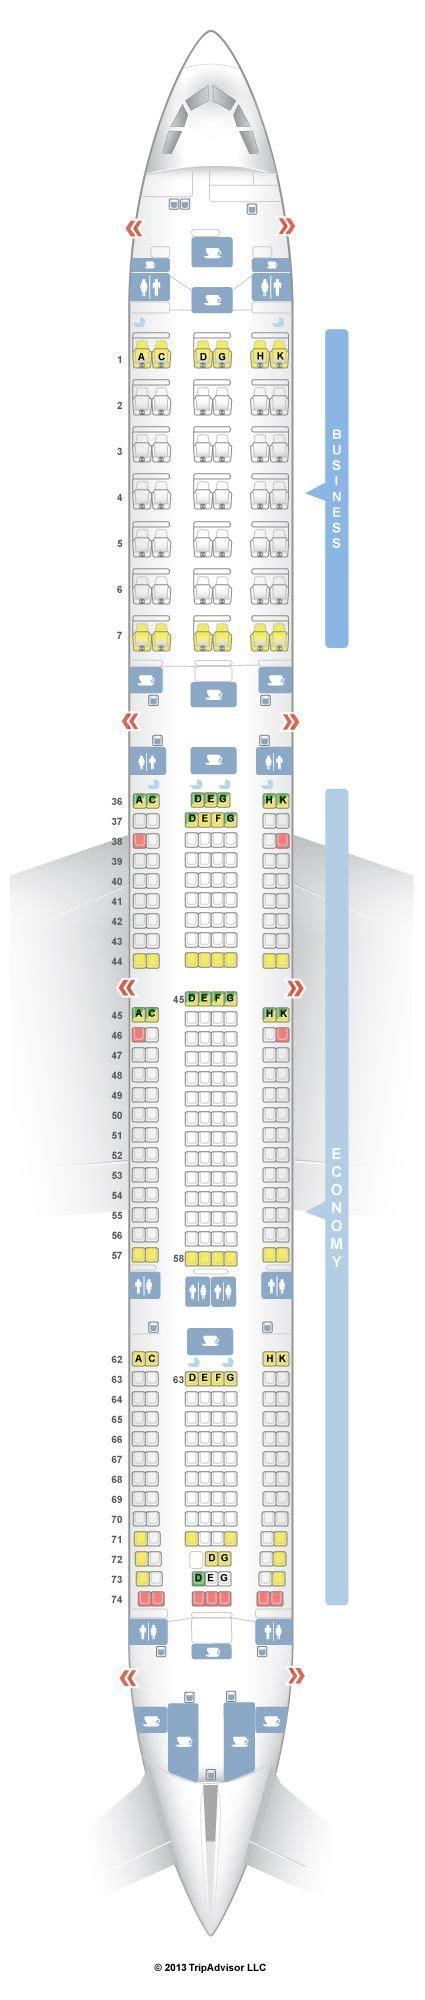 SeatGuru Seat Map South African Airways Airbus A340 600 (346)